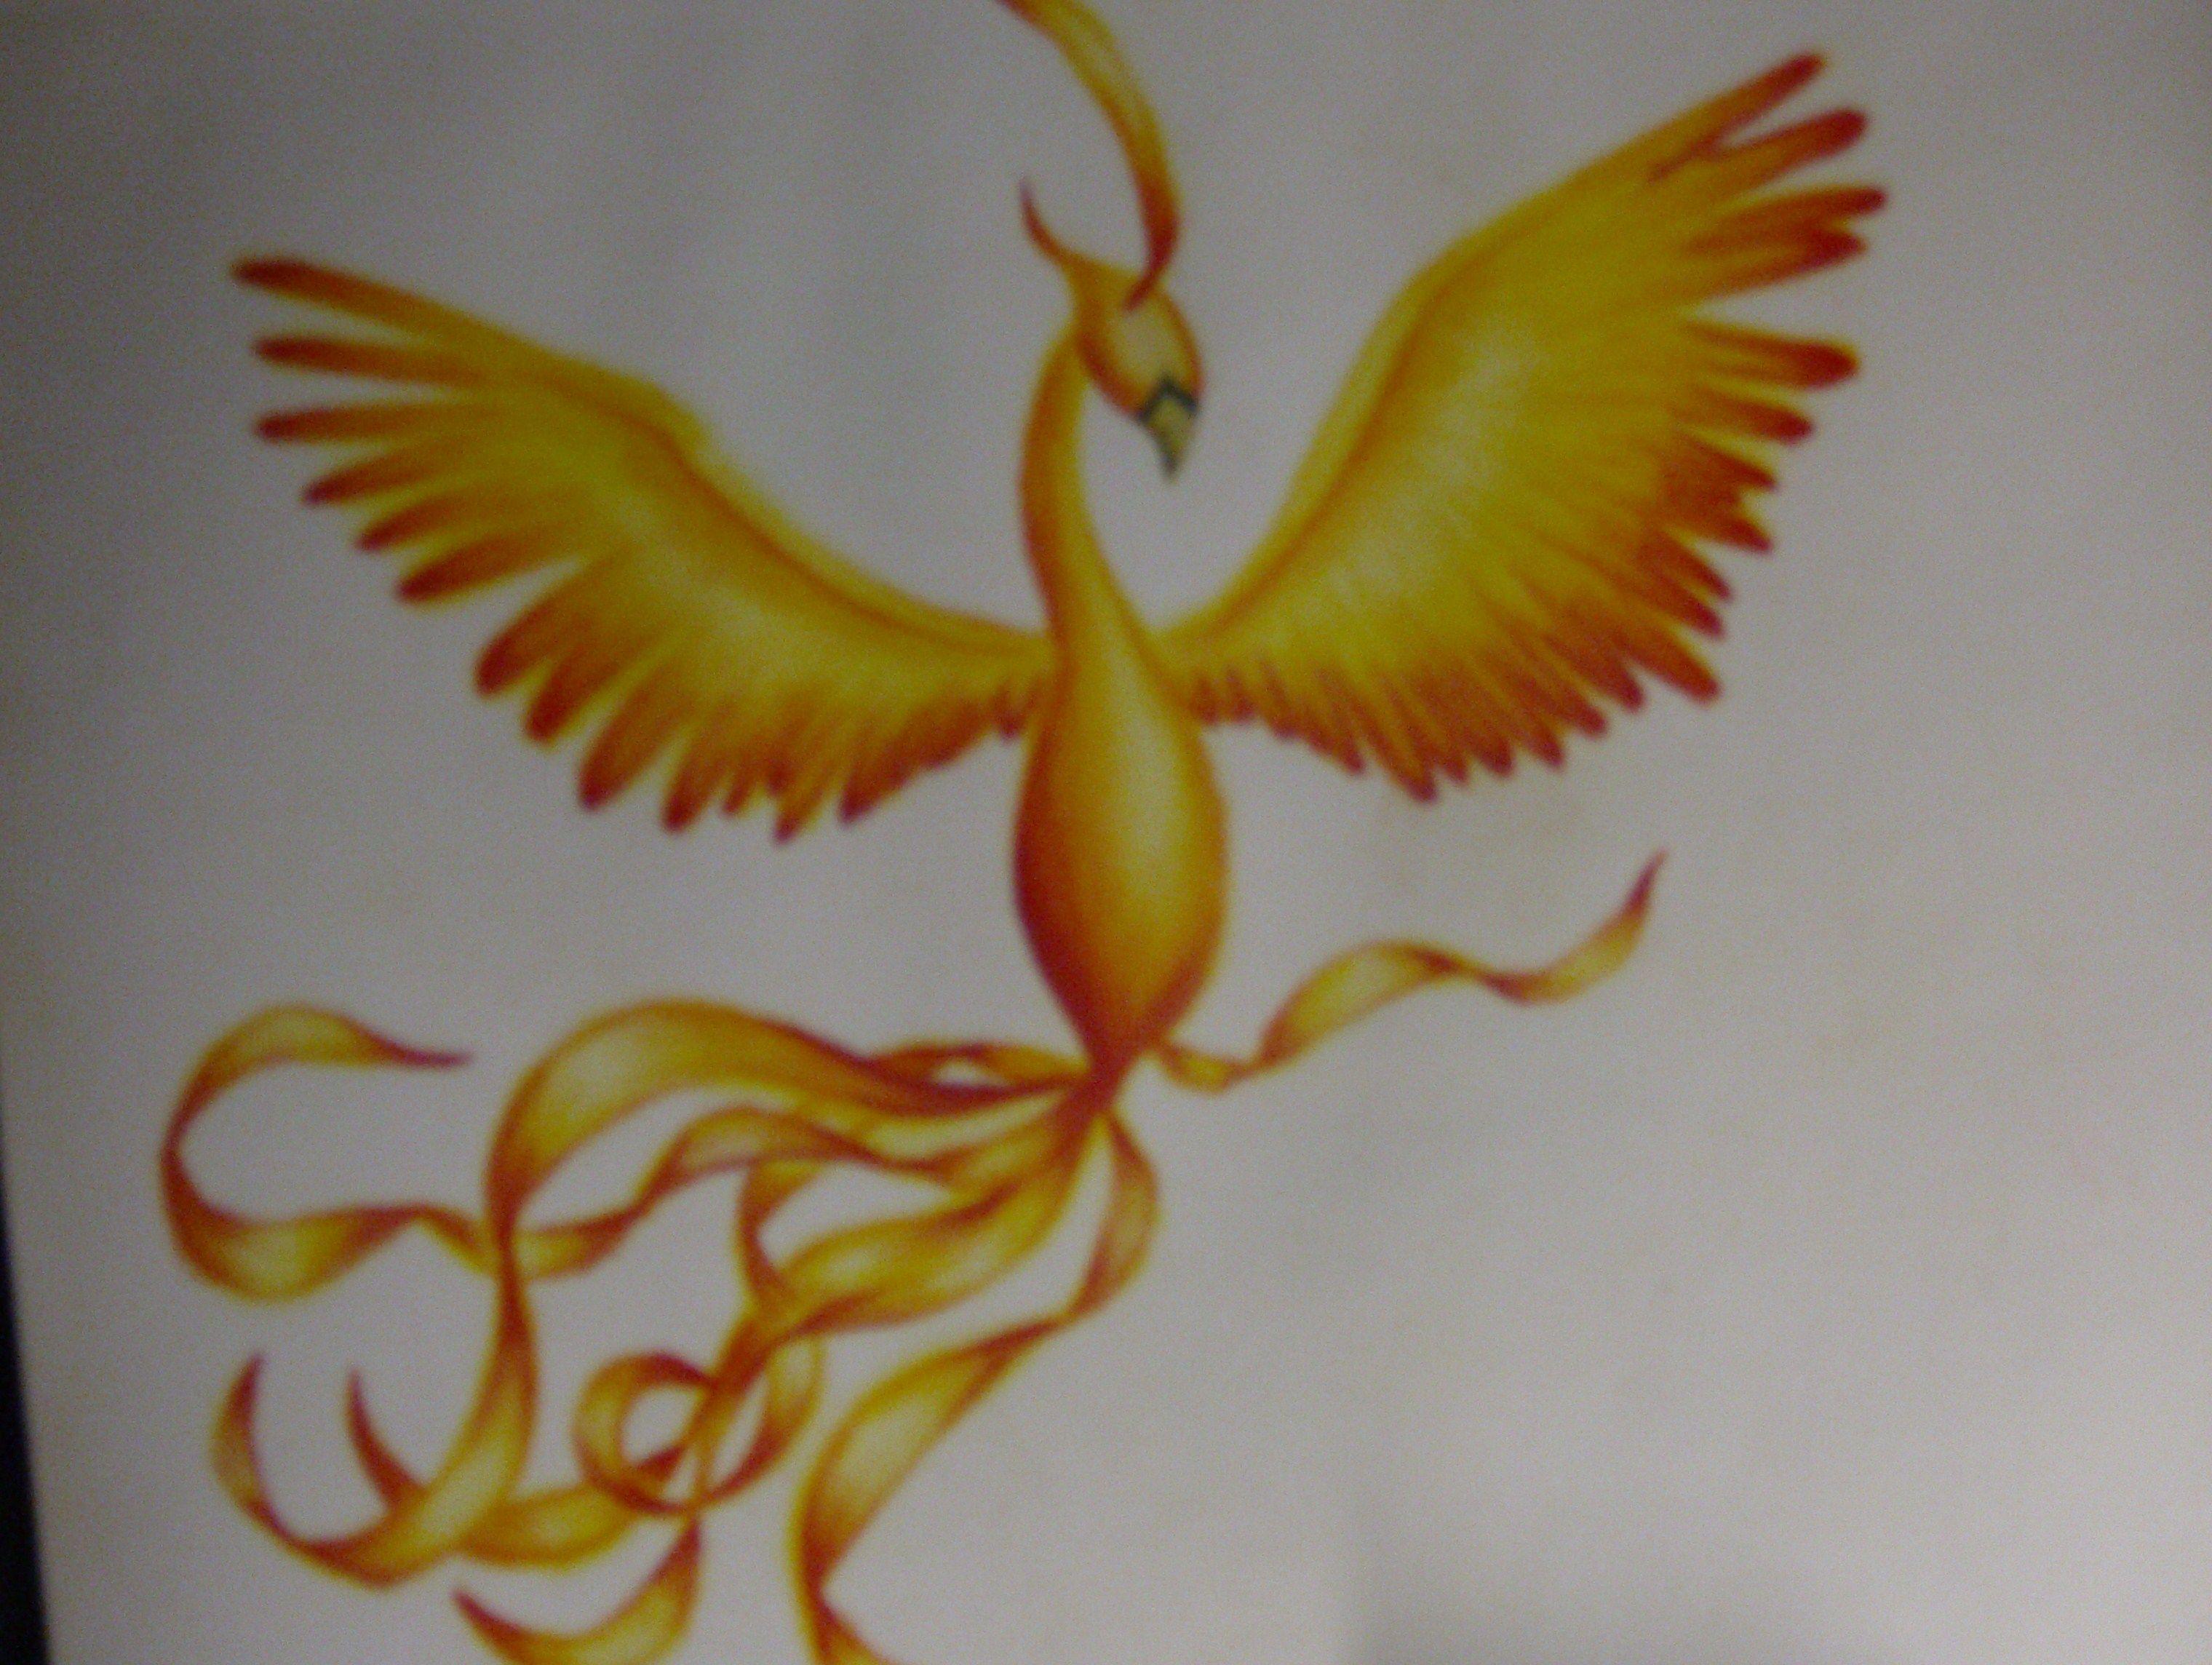 phoenix drawing I did way back when